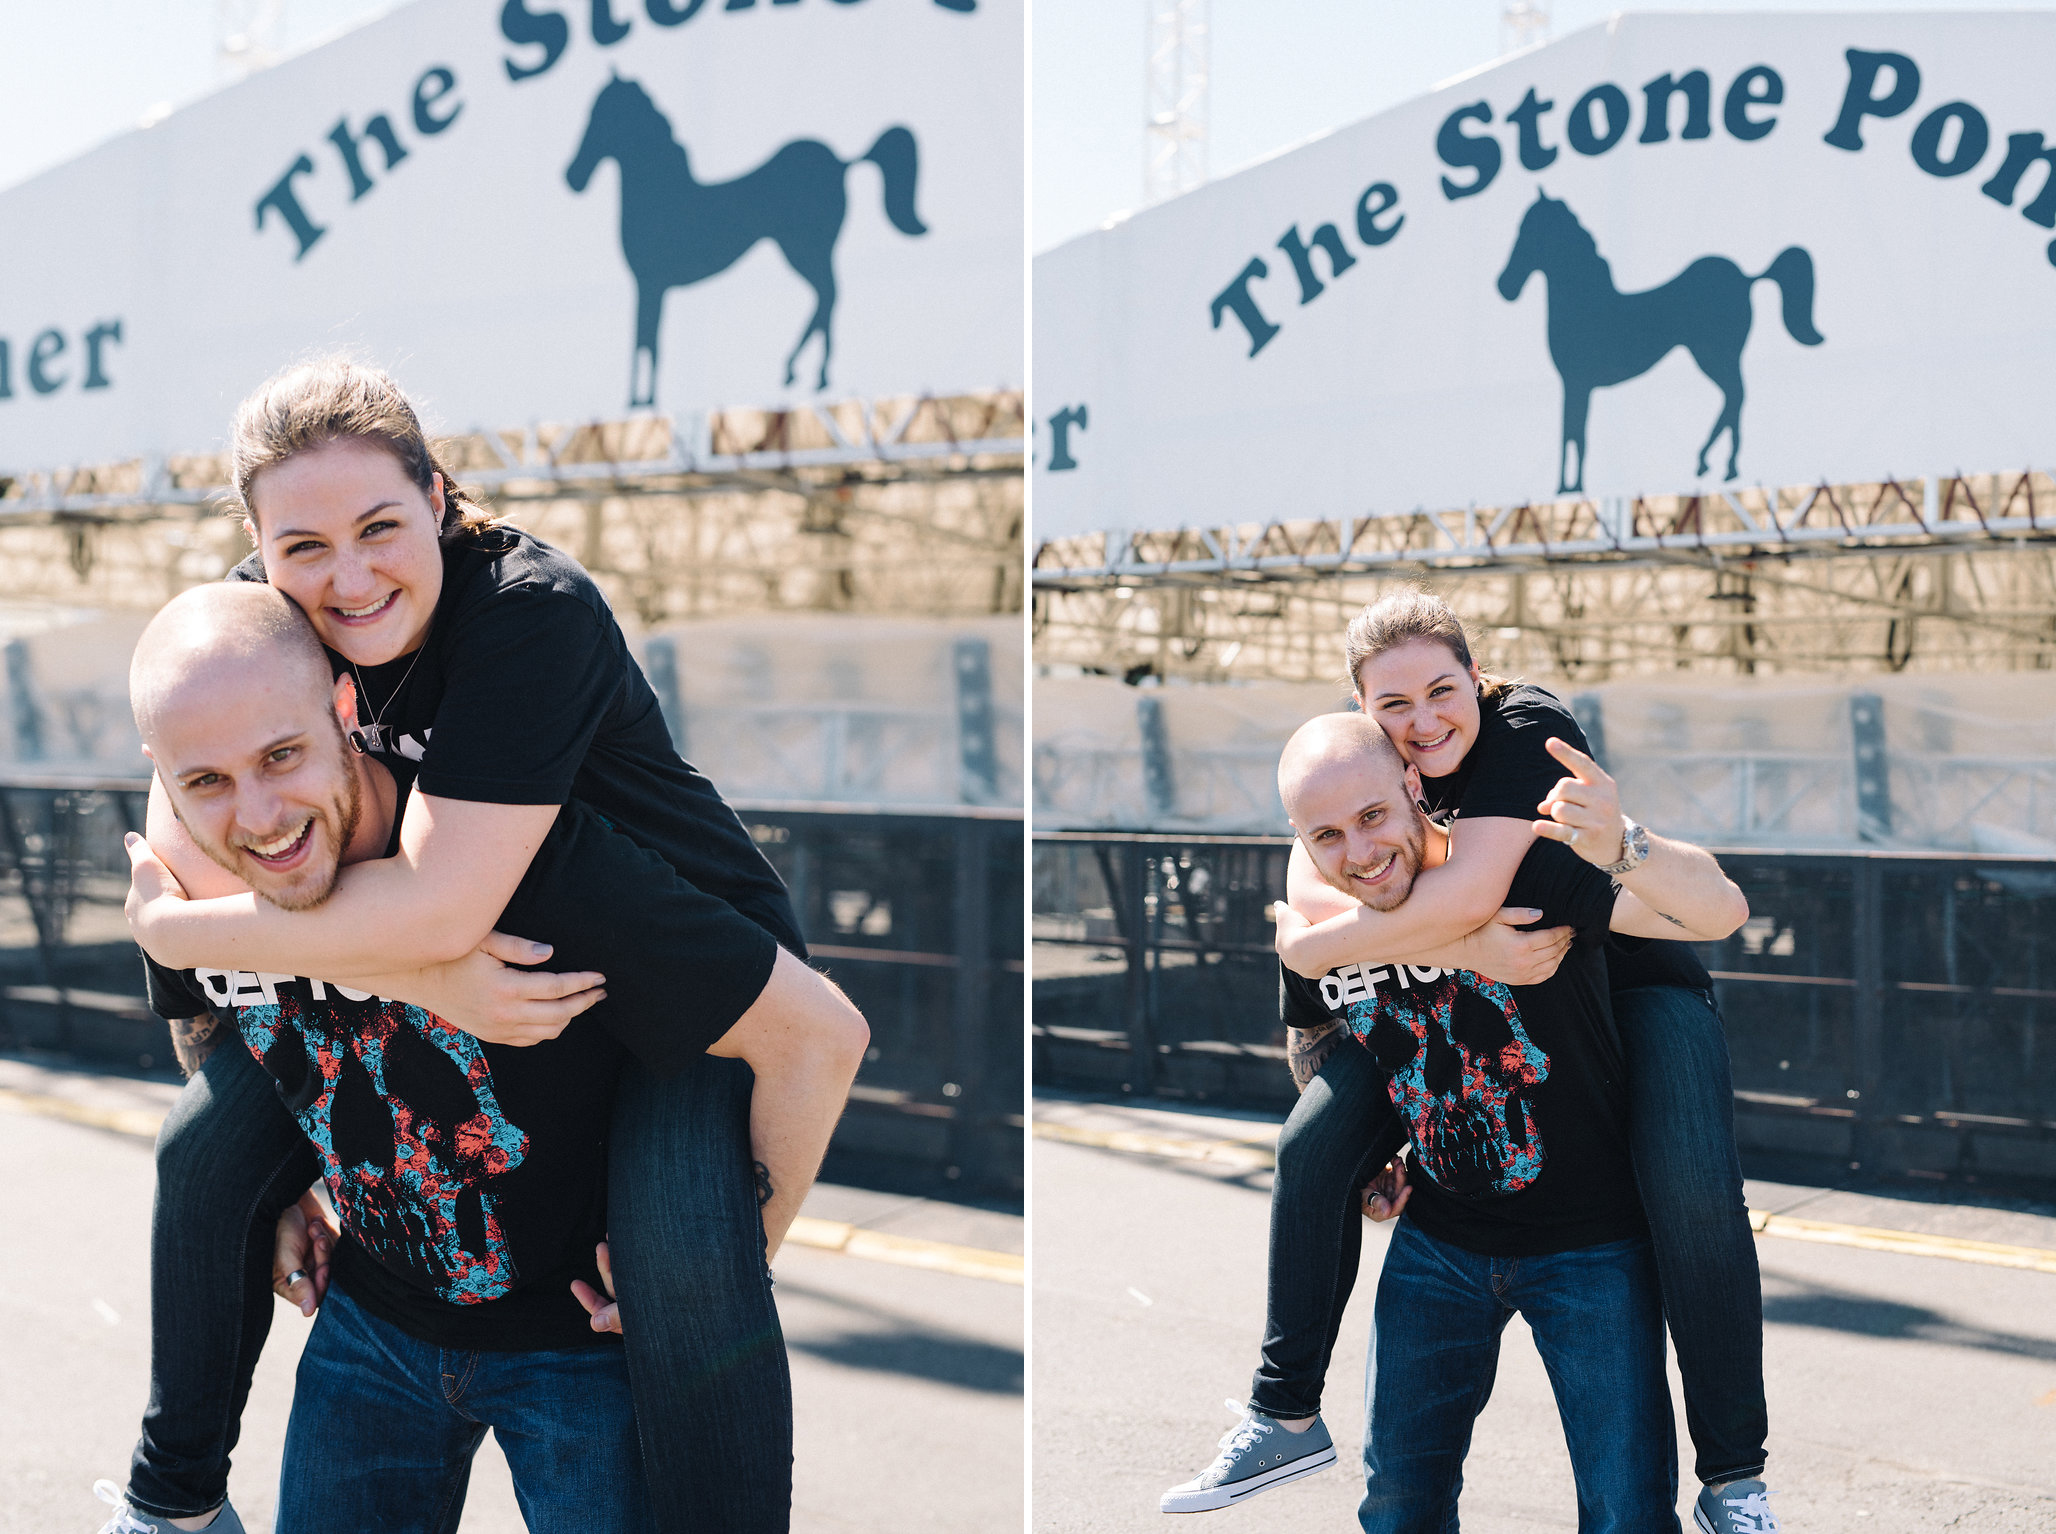 Stone Pony Summer Stage- Deftones Tshirts- Mallory+Brian- Asbury Park- New Jersey- Olivia Christina Photo.jpg